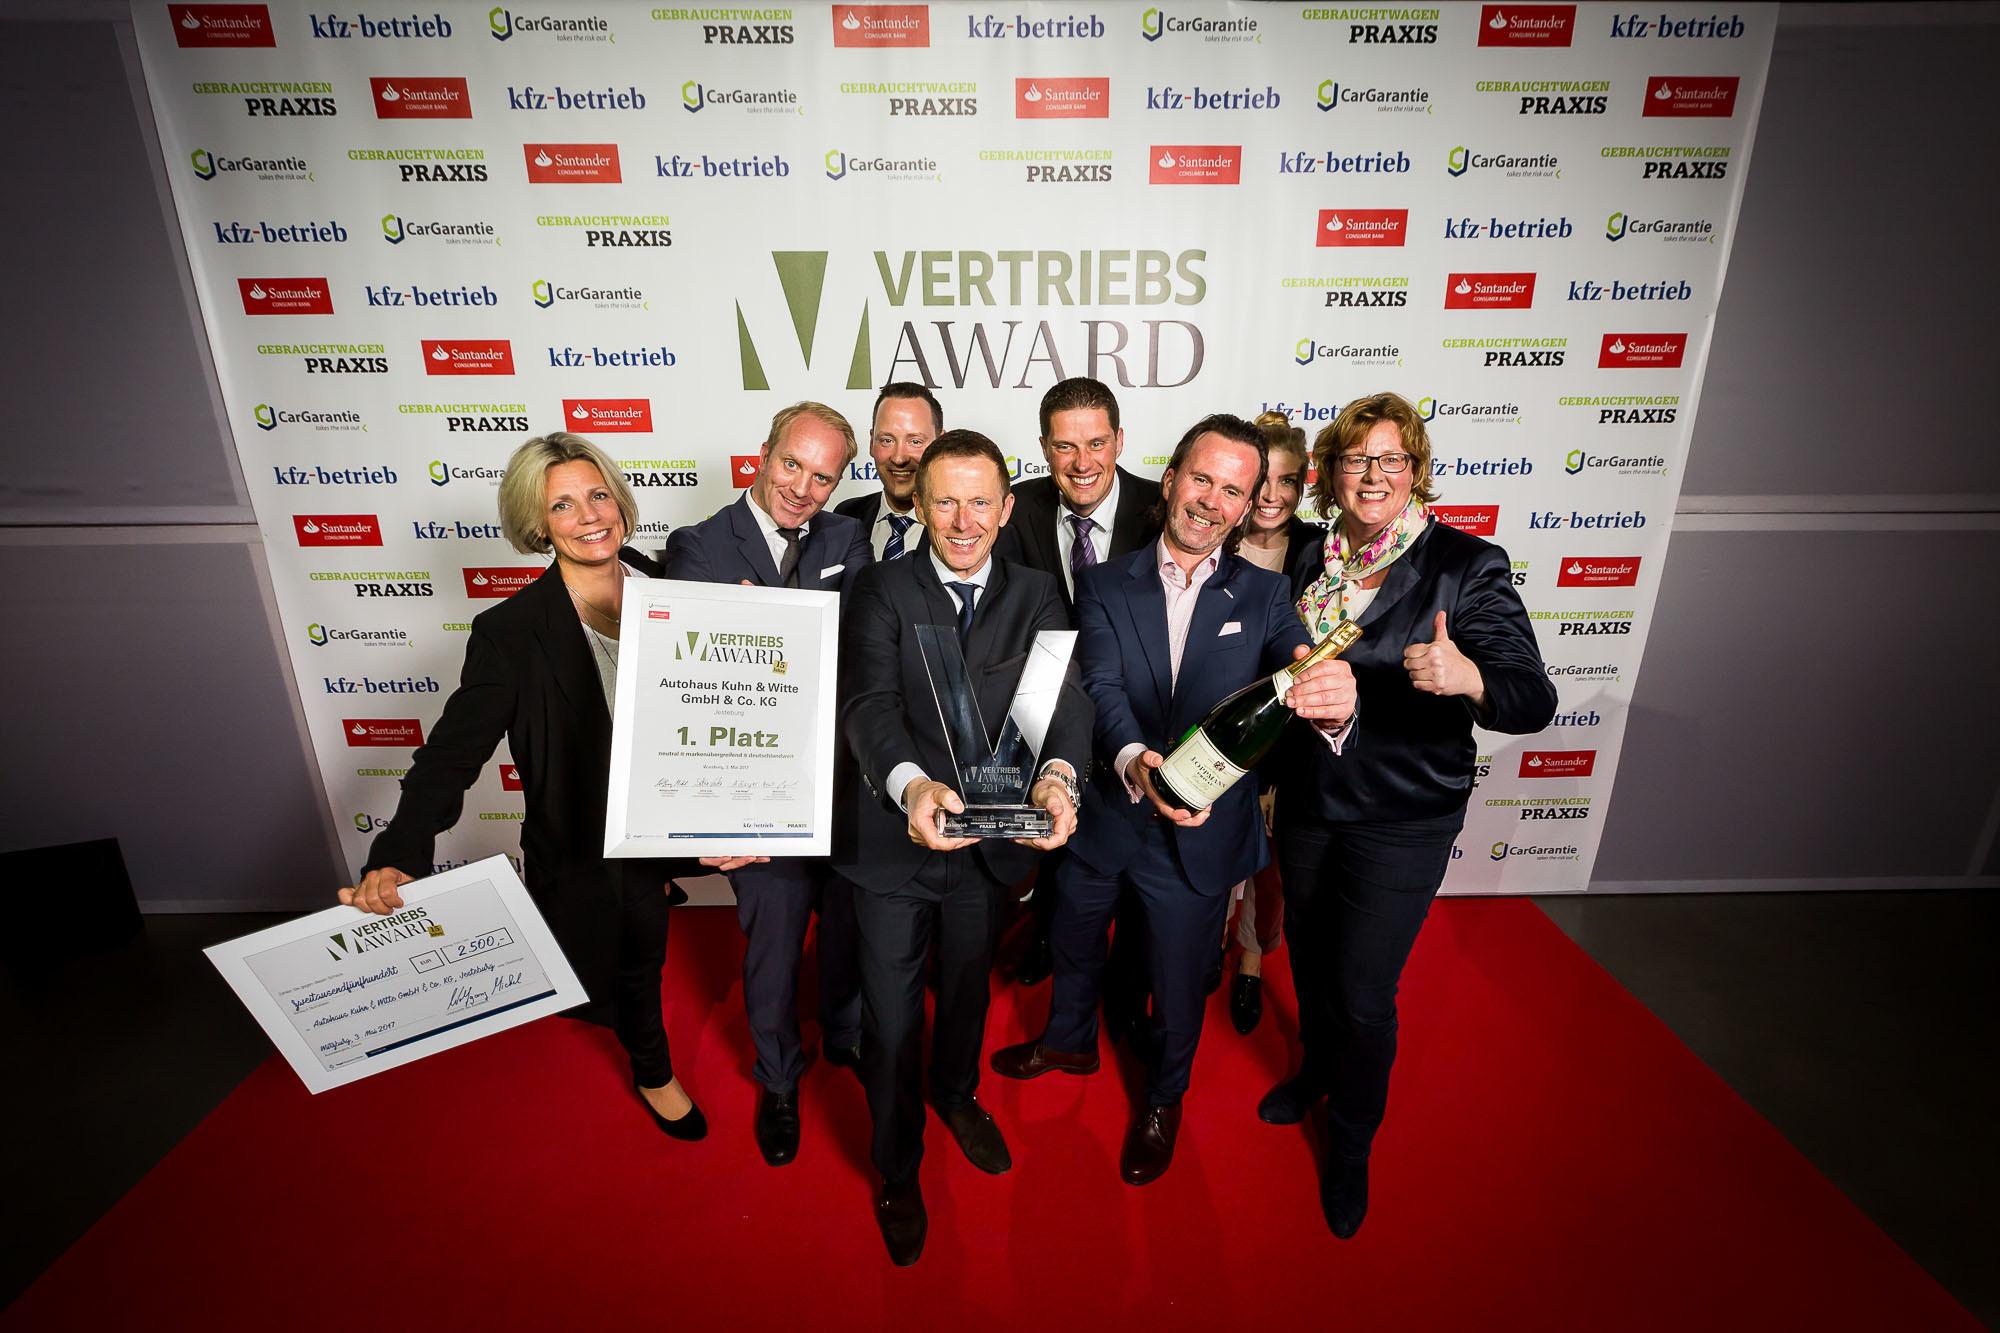 Vertriebs Award 2017